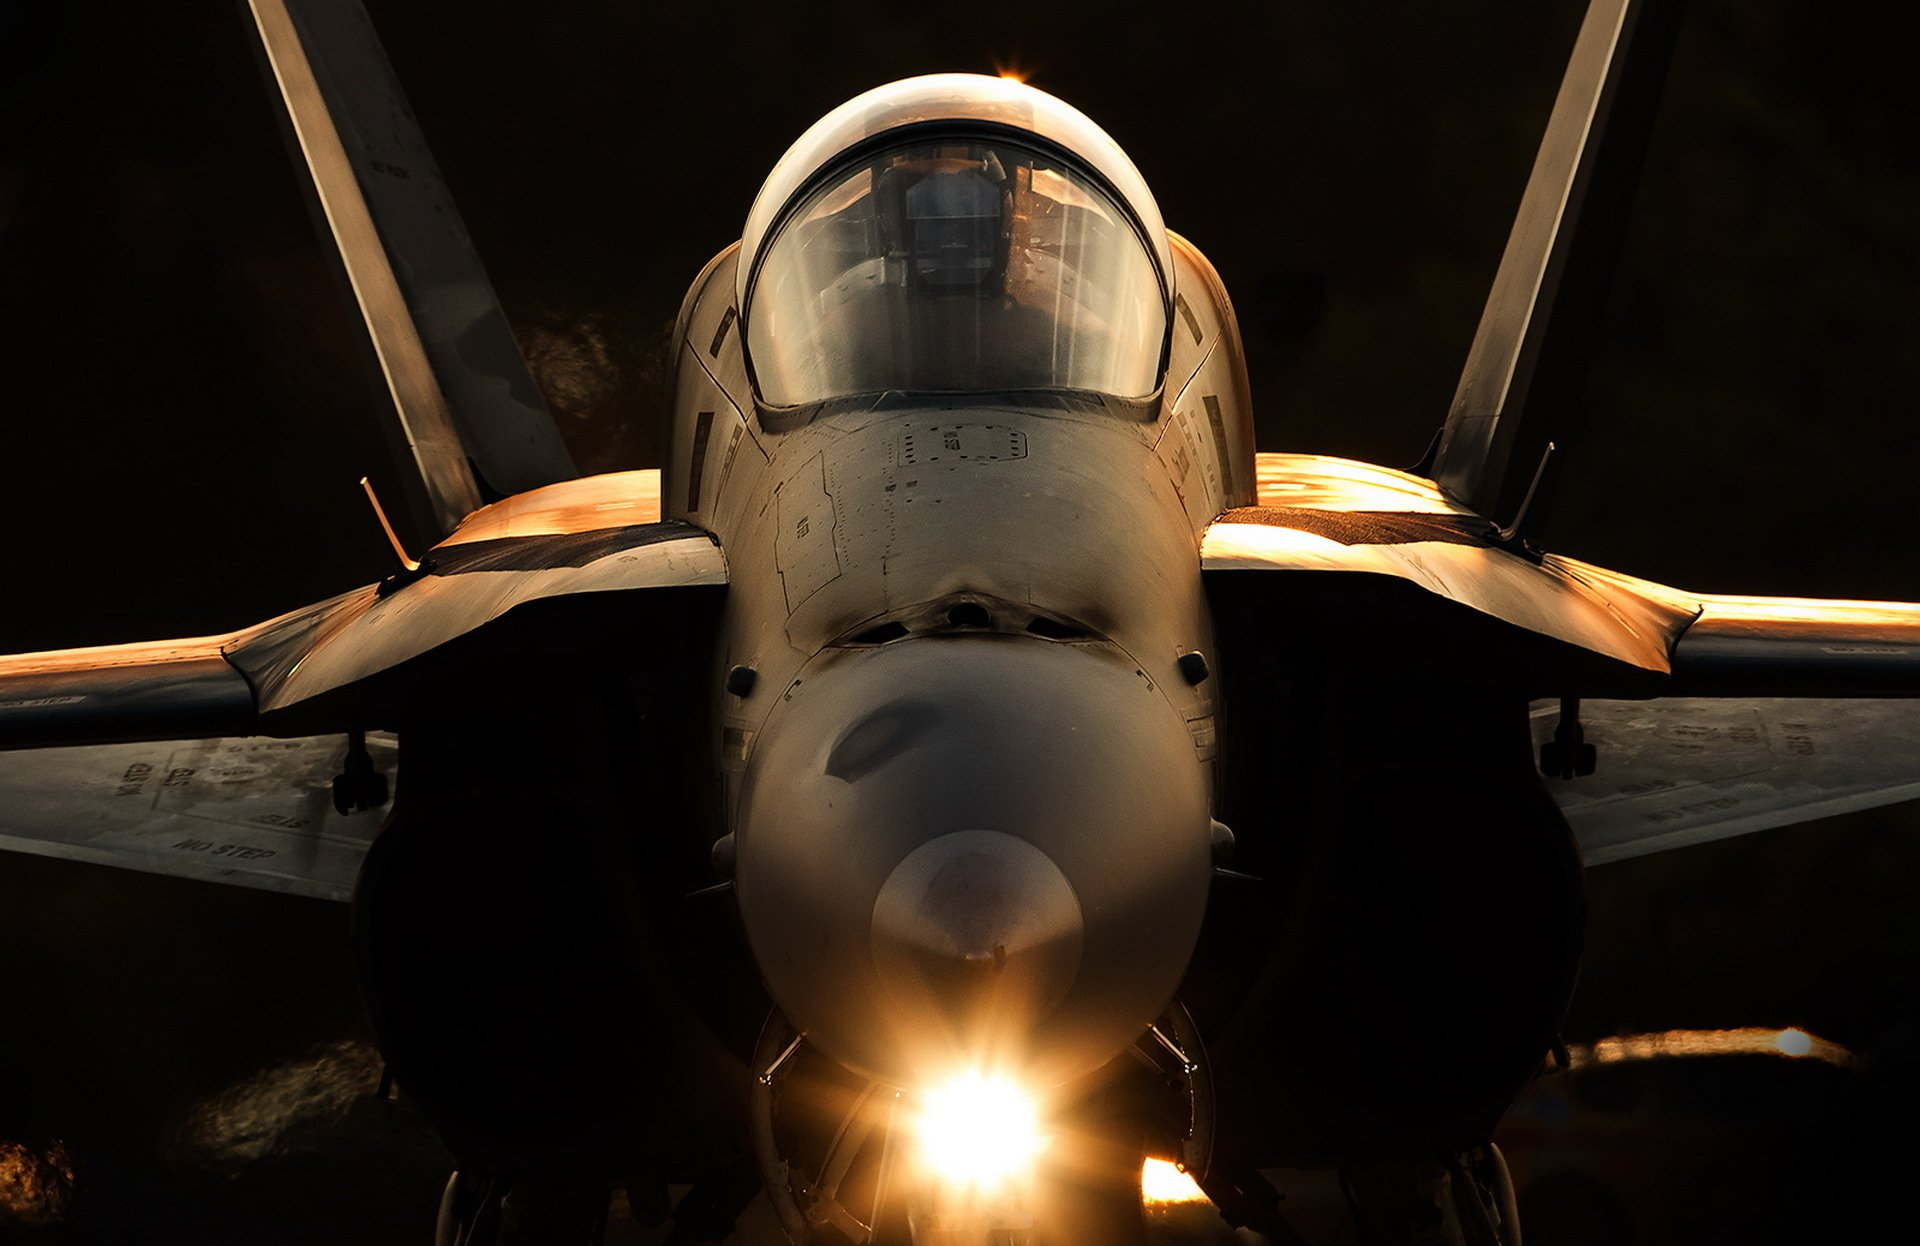 Military - McDonnell Douglas F/A-18 Hornet  Jet Fighter Aircraft Warplane Close-Up Wallpaper